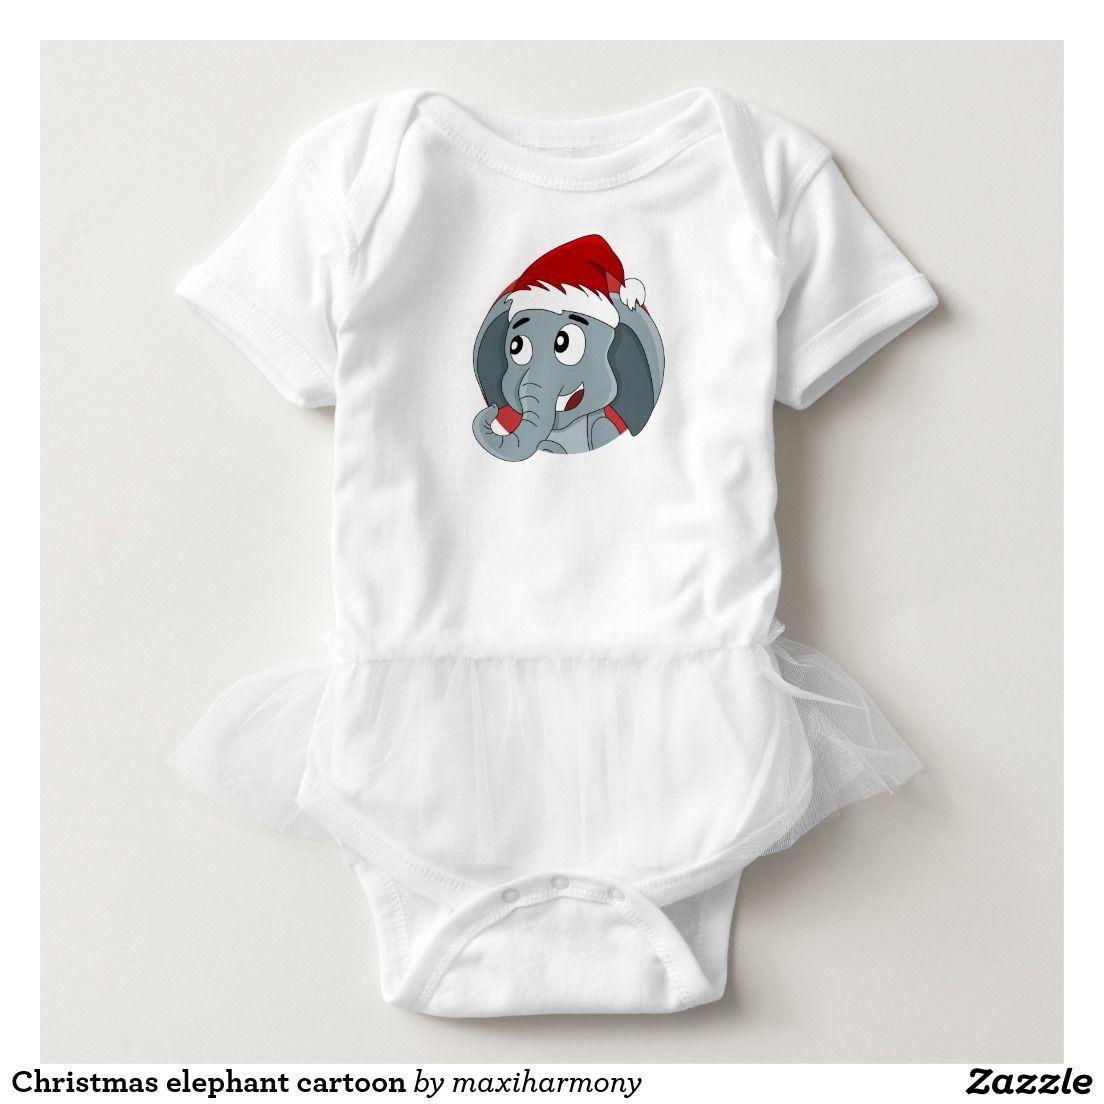 Christmas elephant cartoon t-shirts